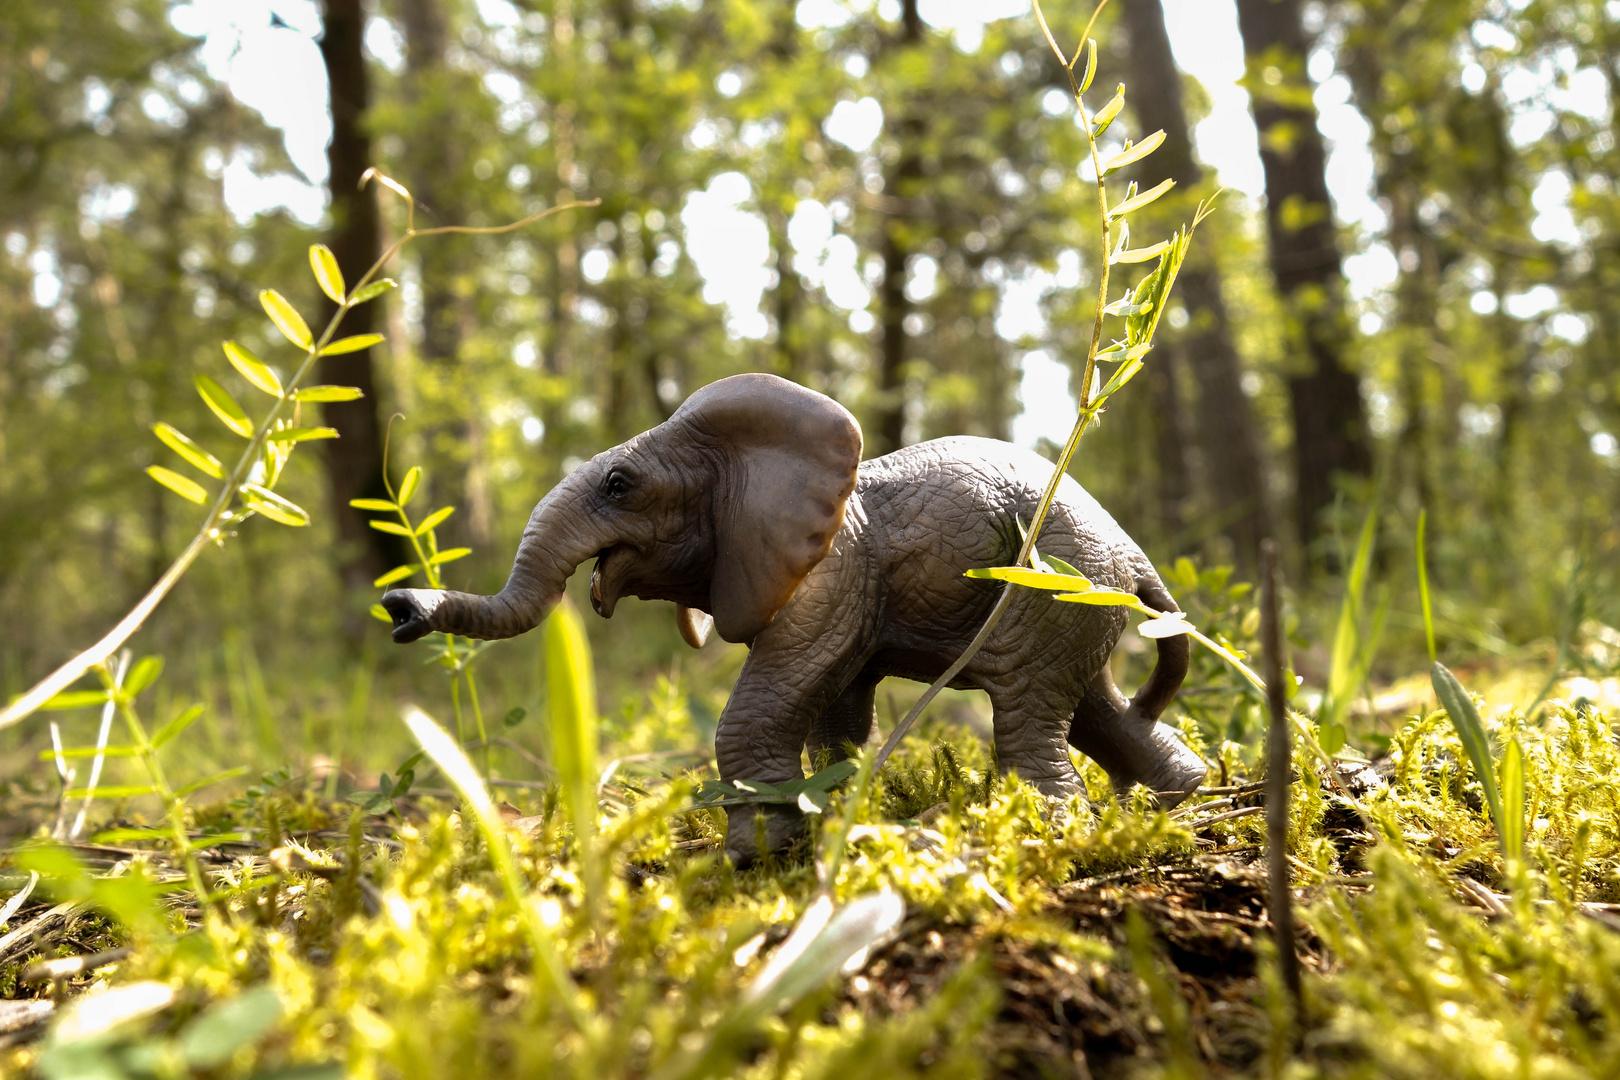 Elefant im Wald?!